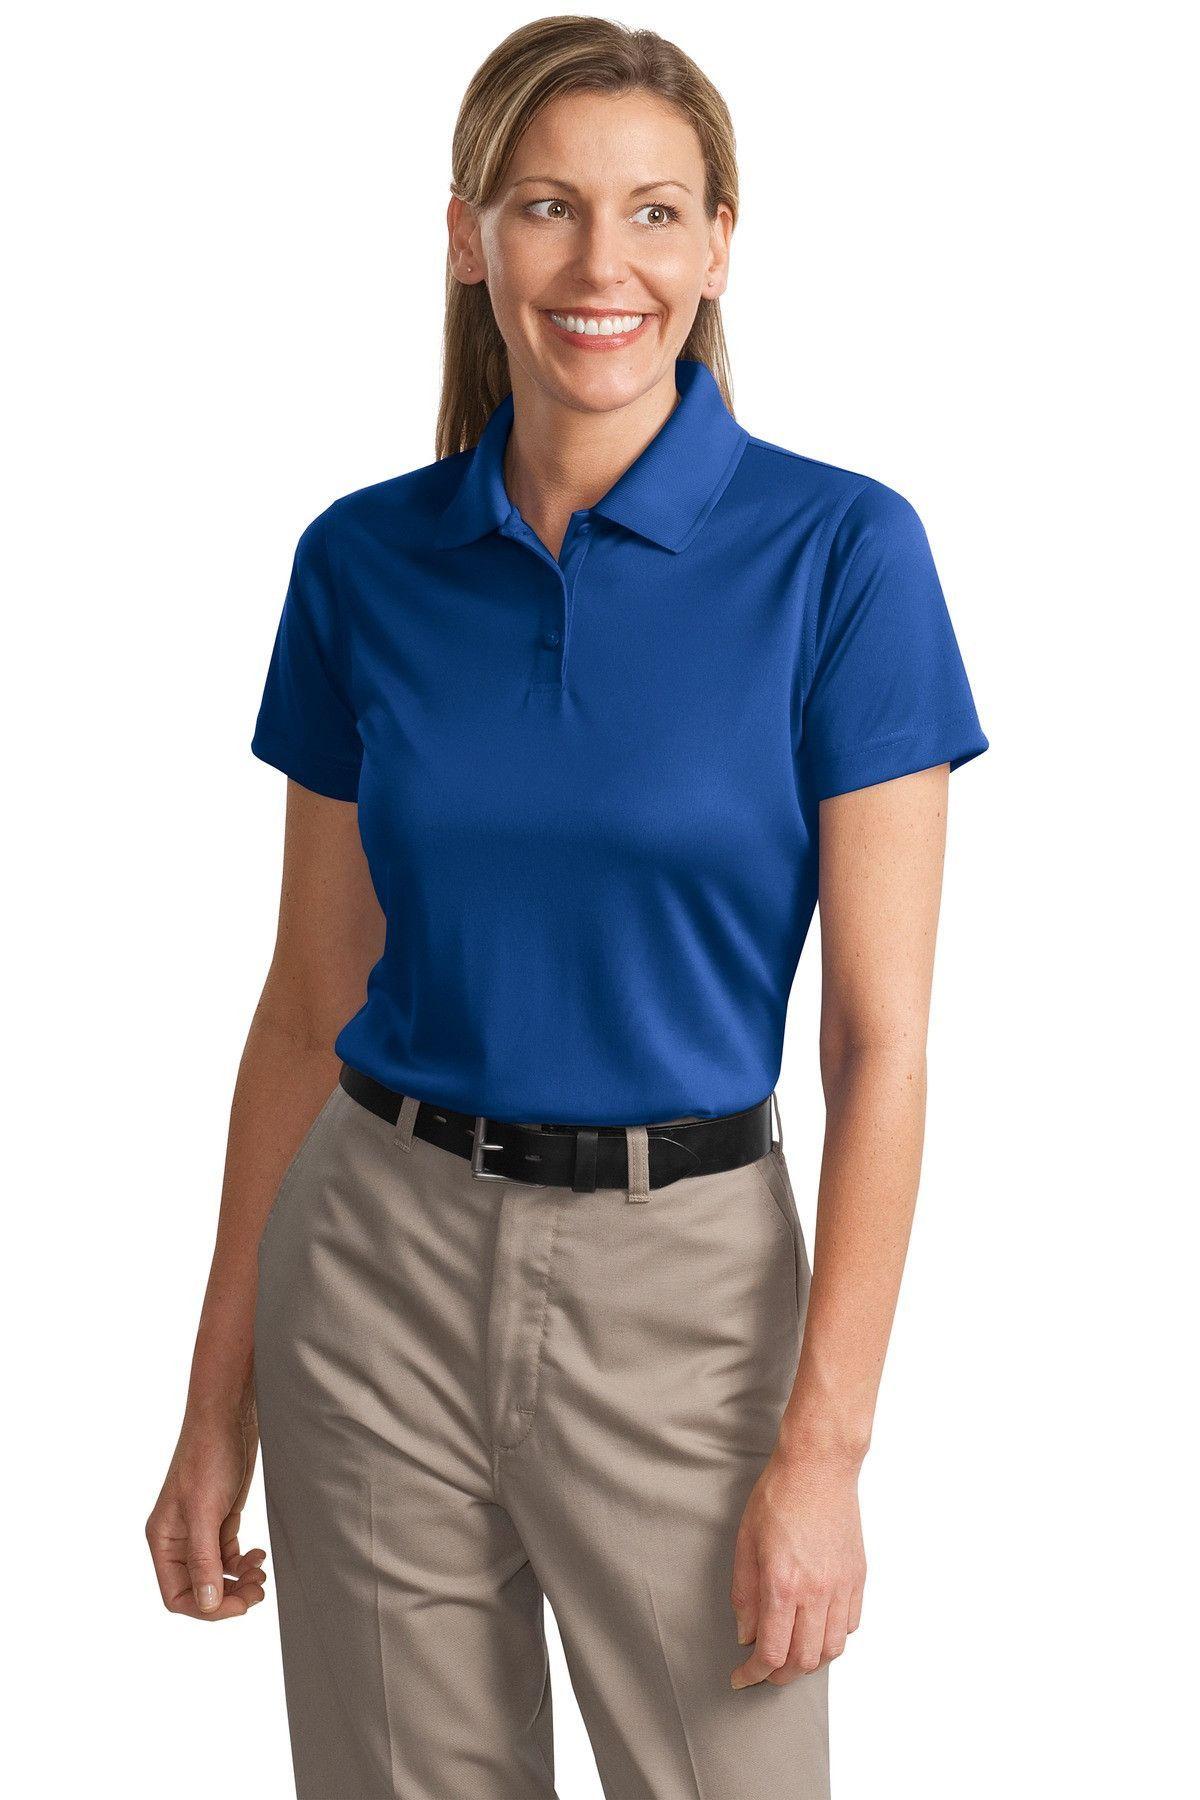 CornerStone - Ladies Select Snag-Proof Polo. CS413 Royal